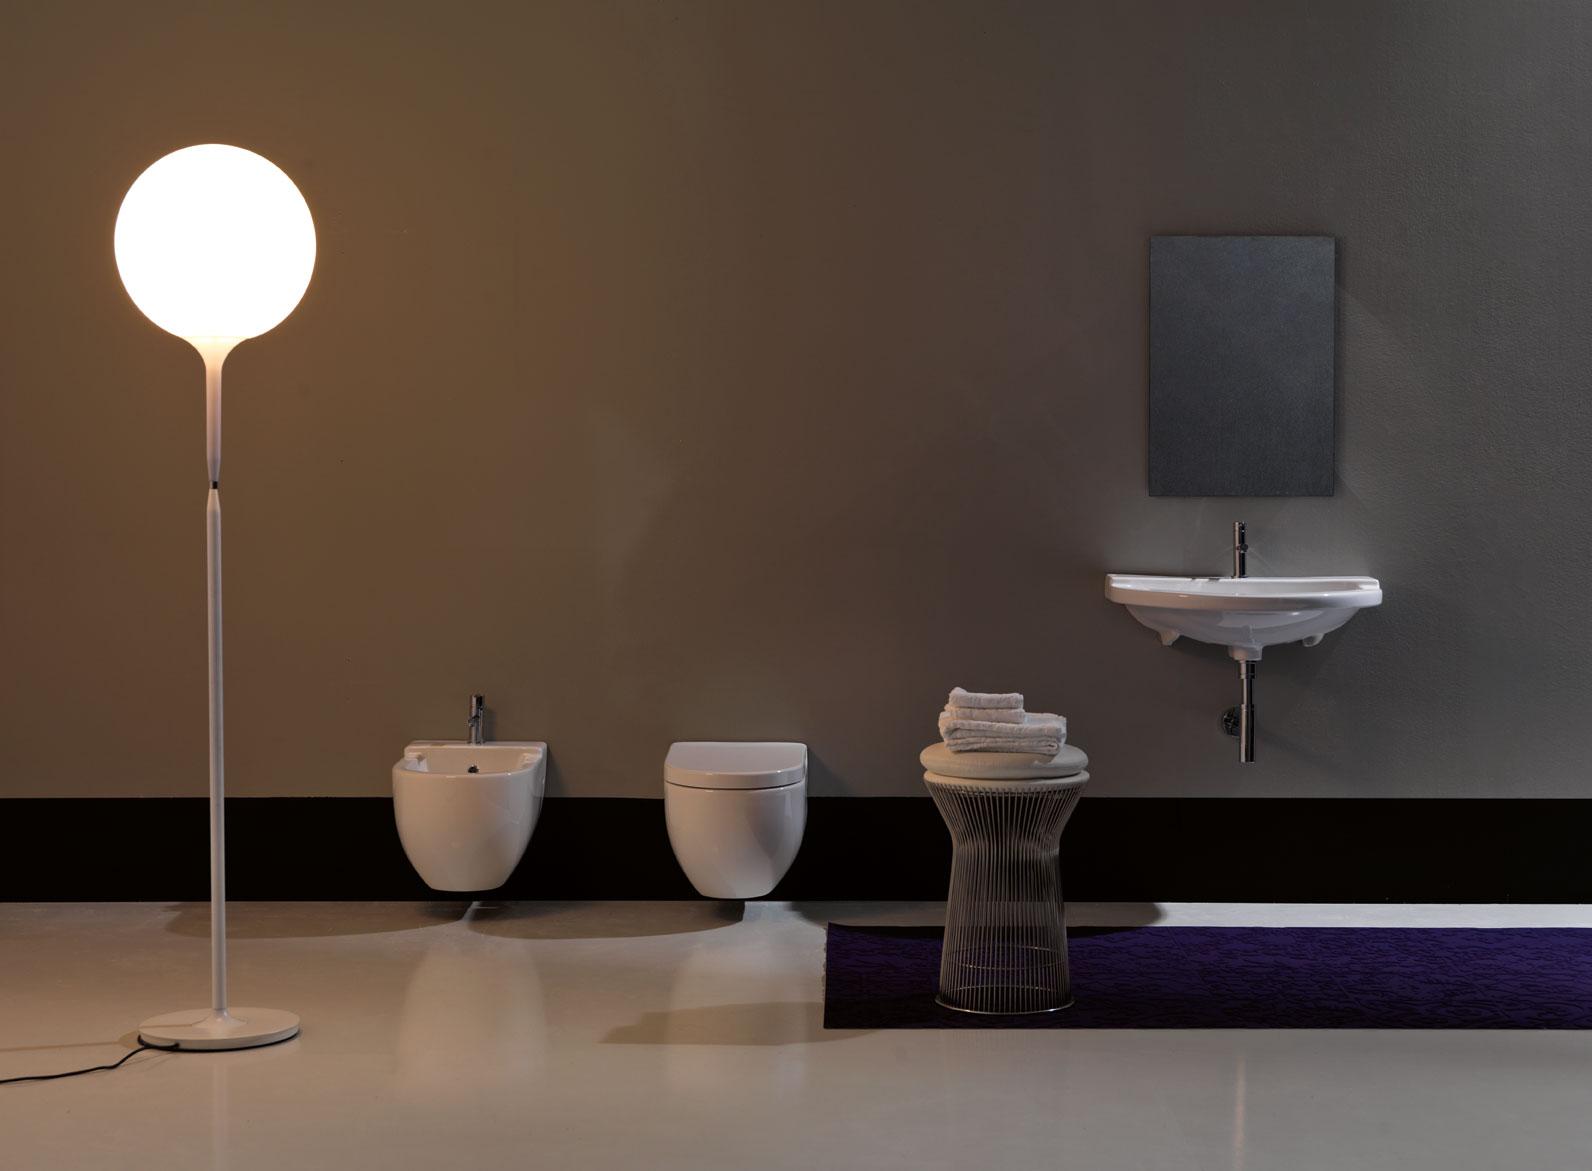 Urinoir In Badkamer : Sanitair & keramiek interdoccia